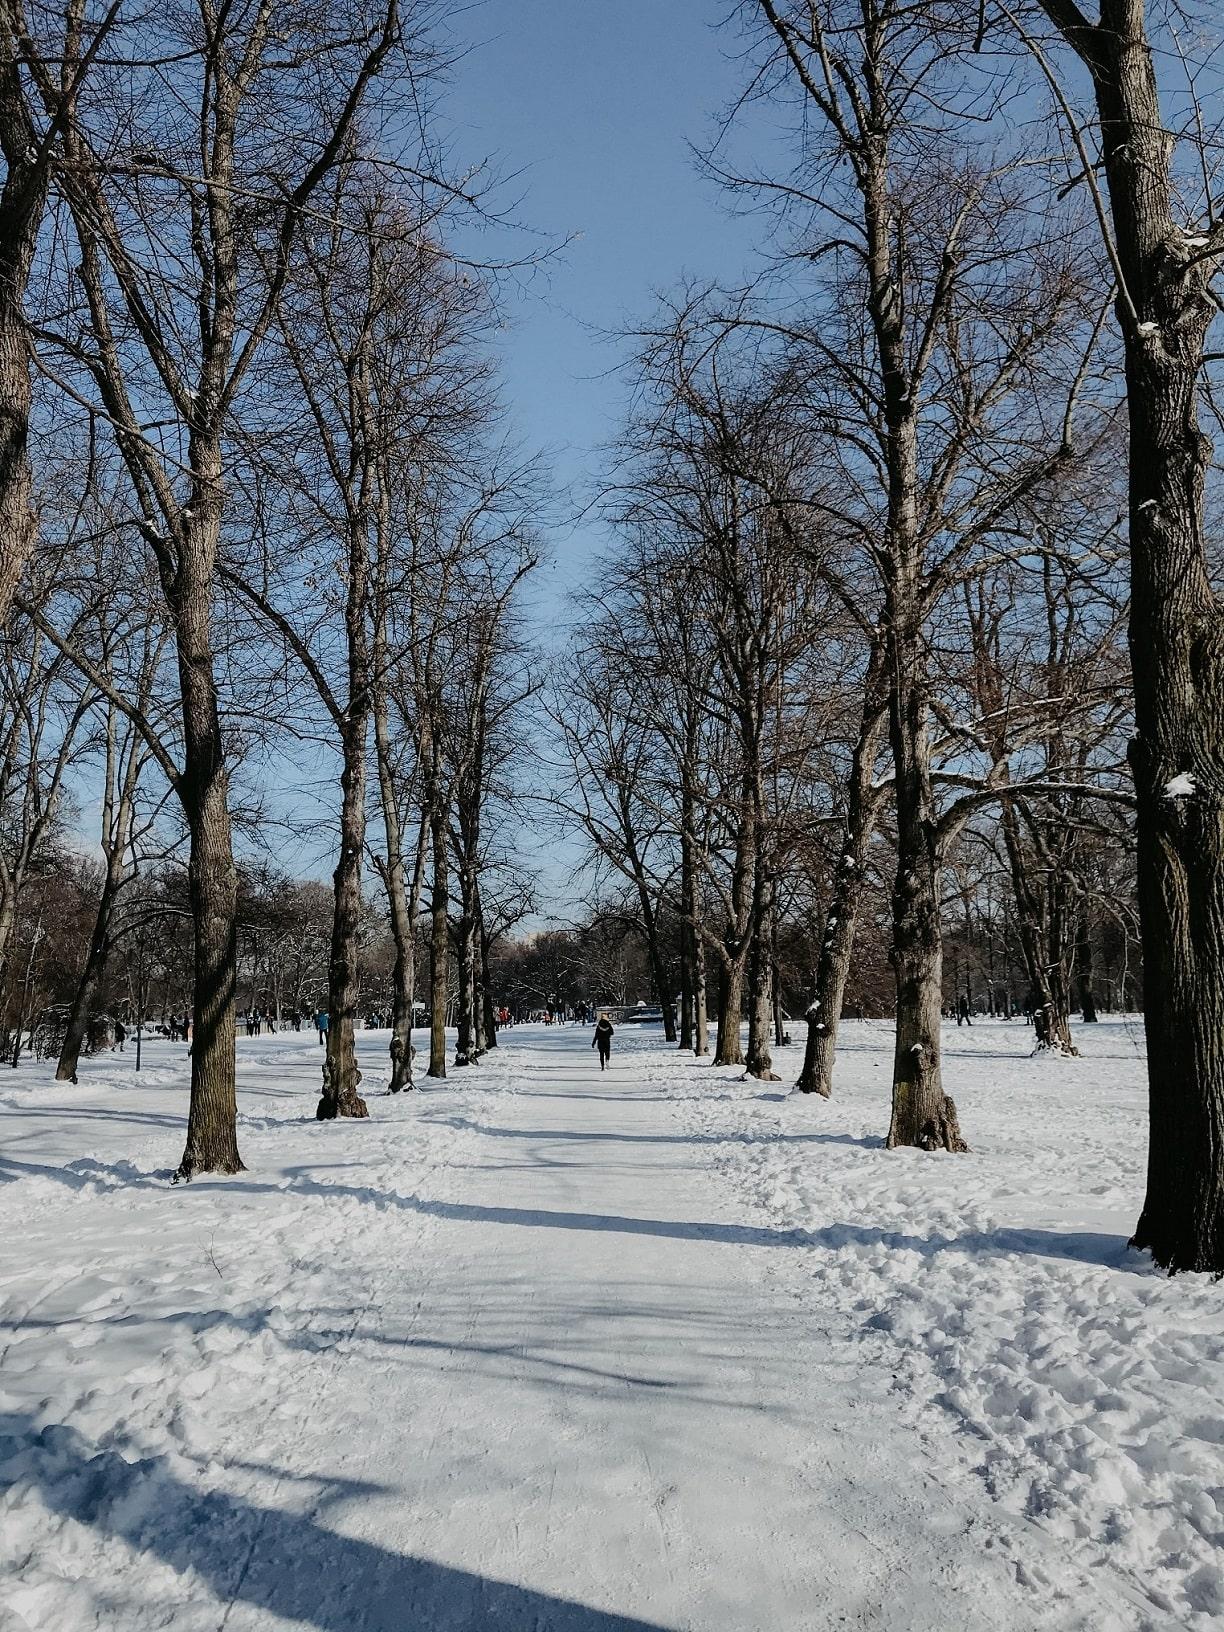 clarapark-leipzig-februar-hello-again